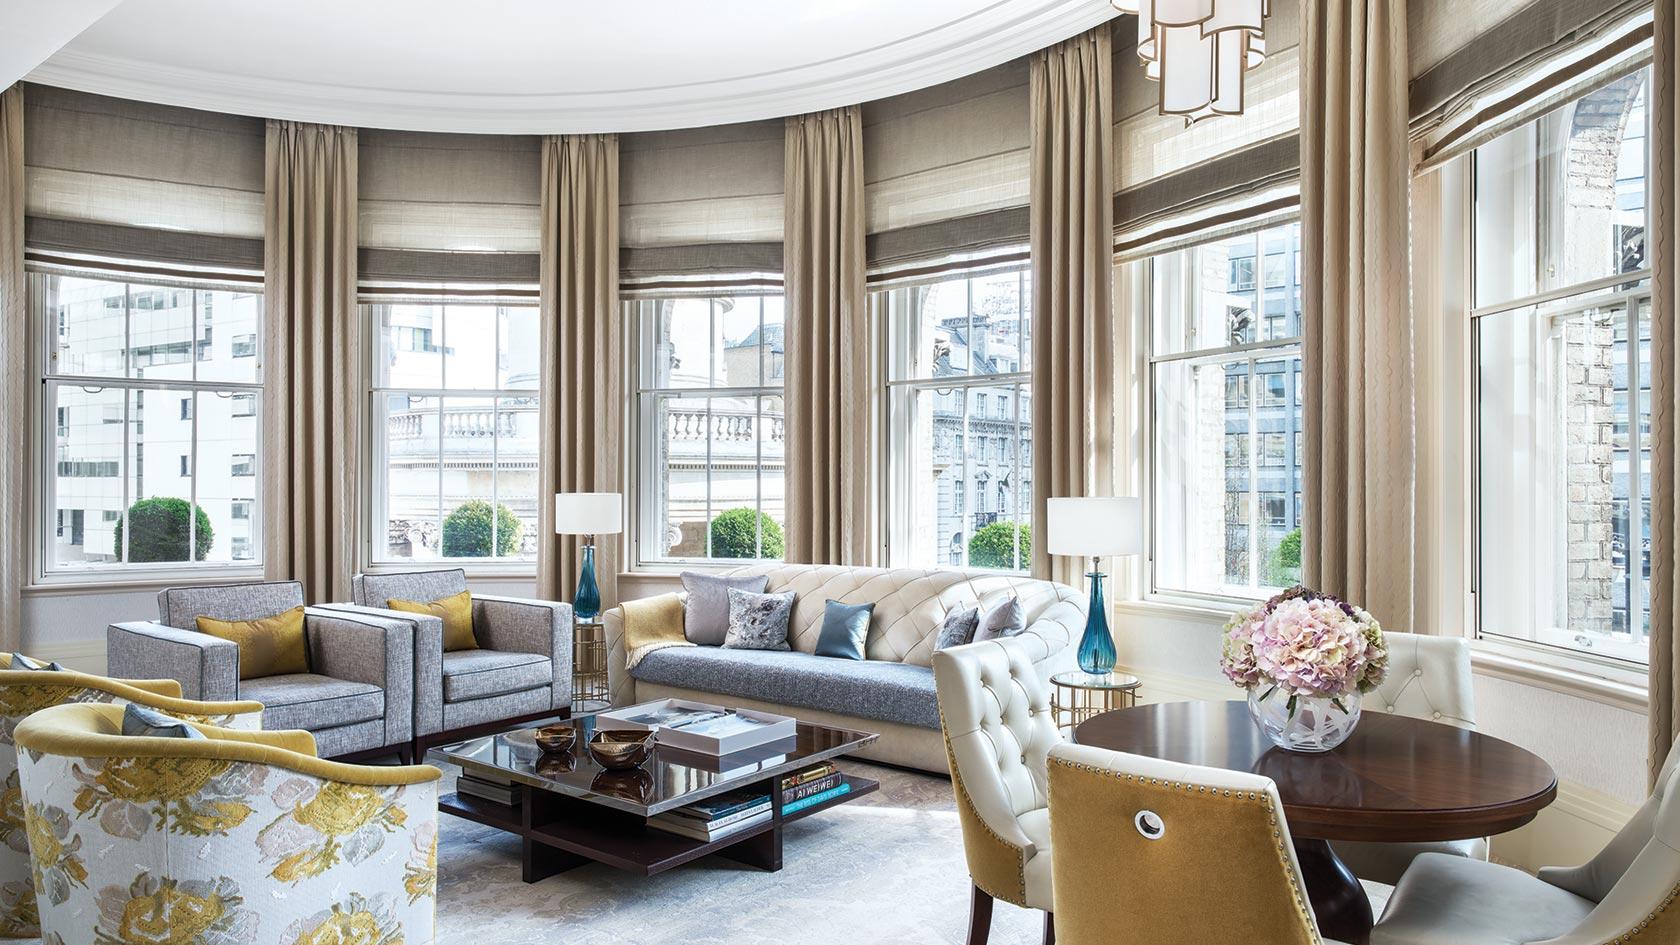 tllon-rooms-infinity-suite-living-room-1680-945.jpg